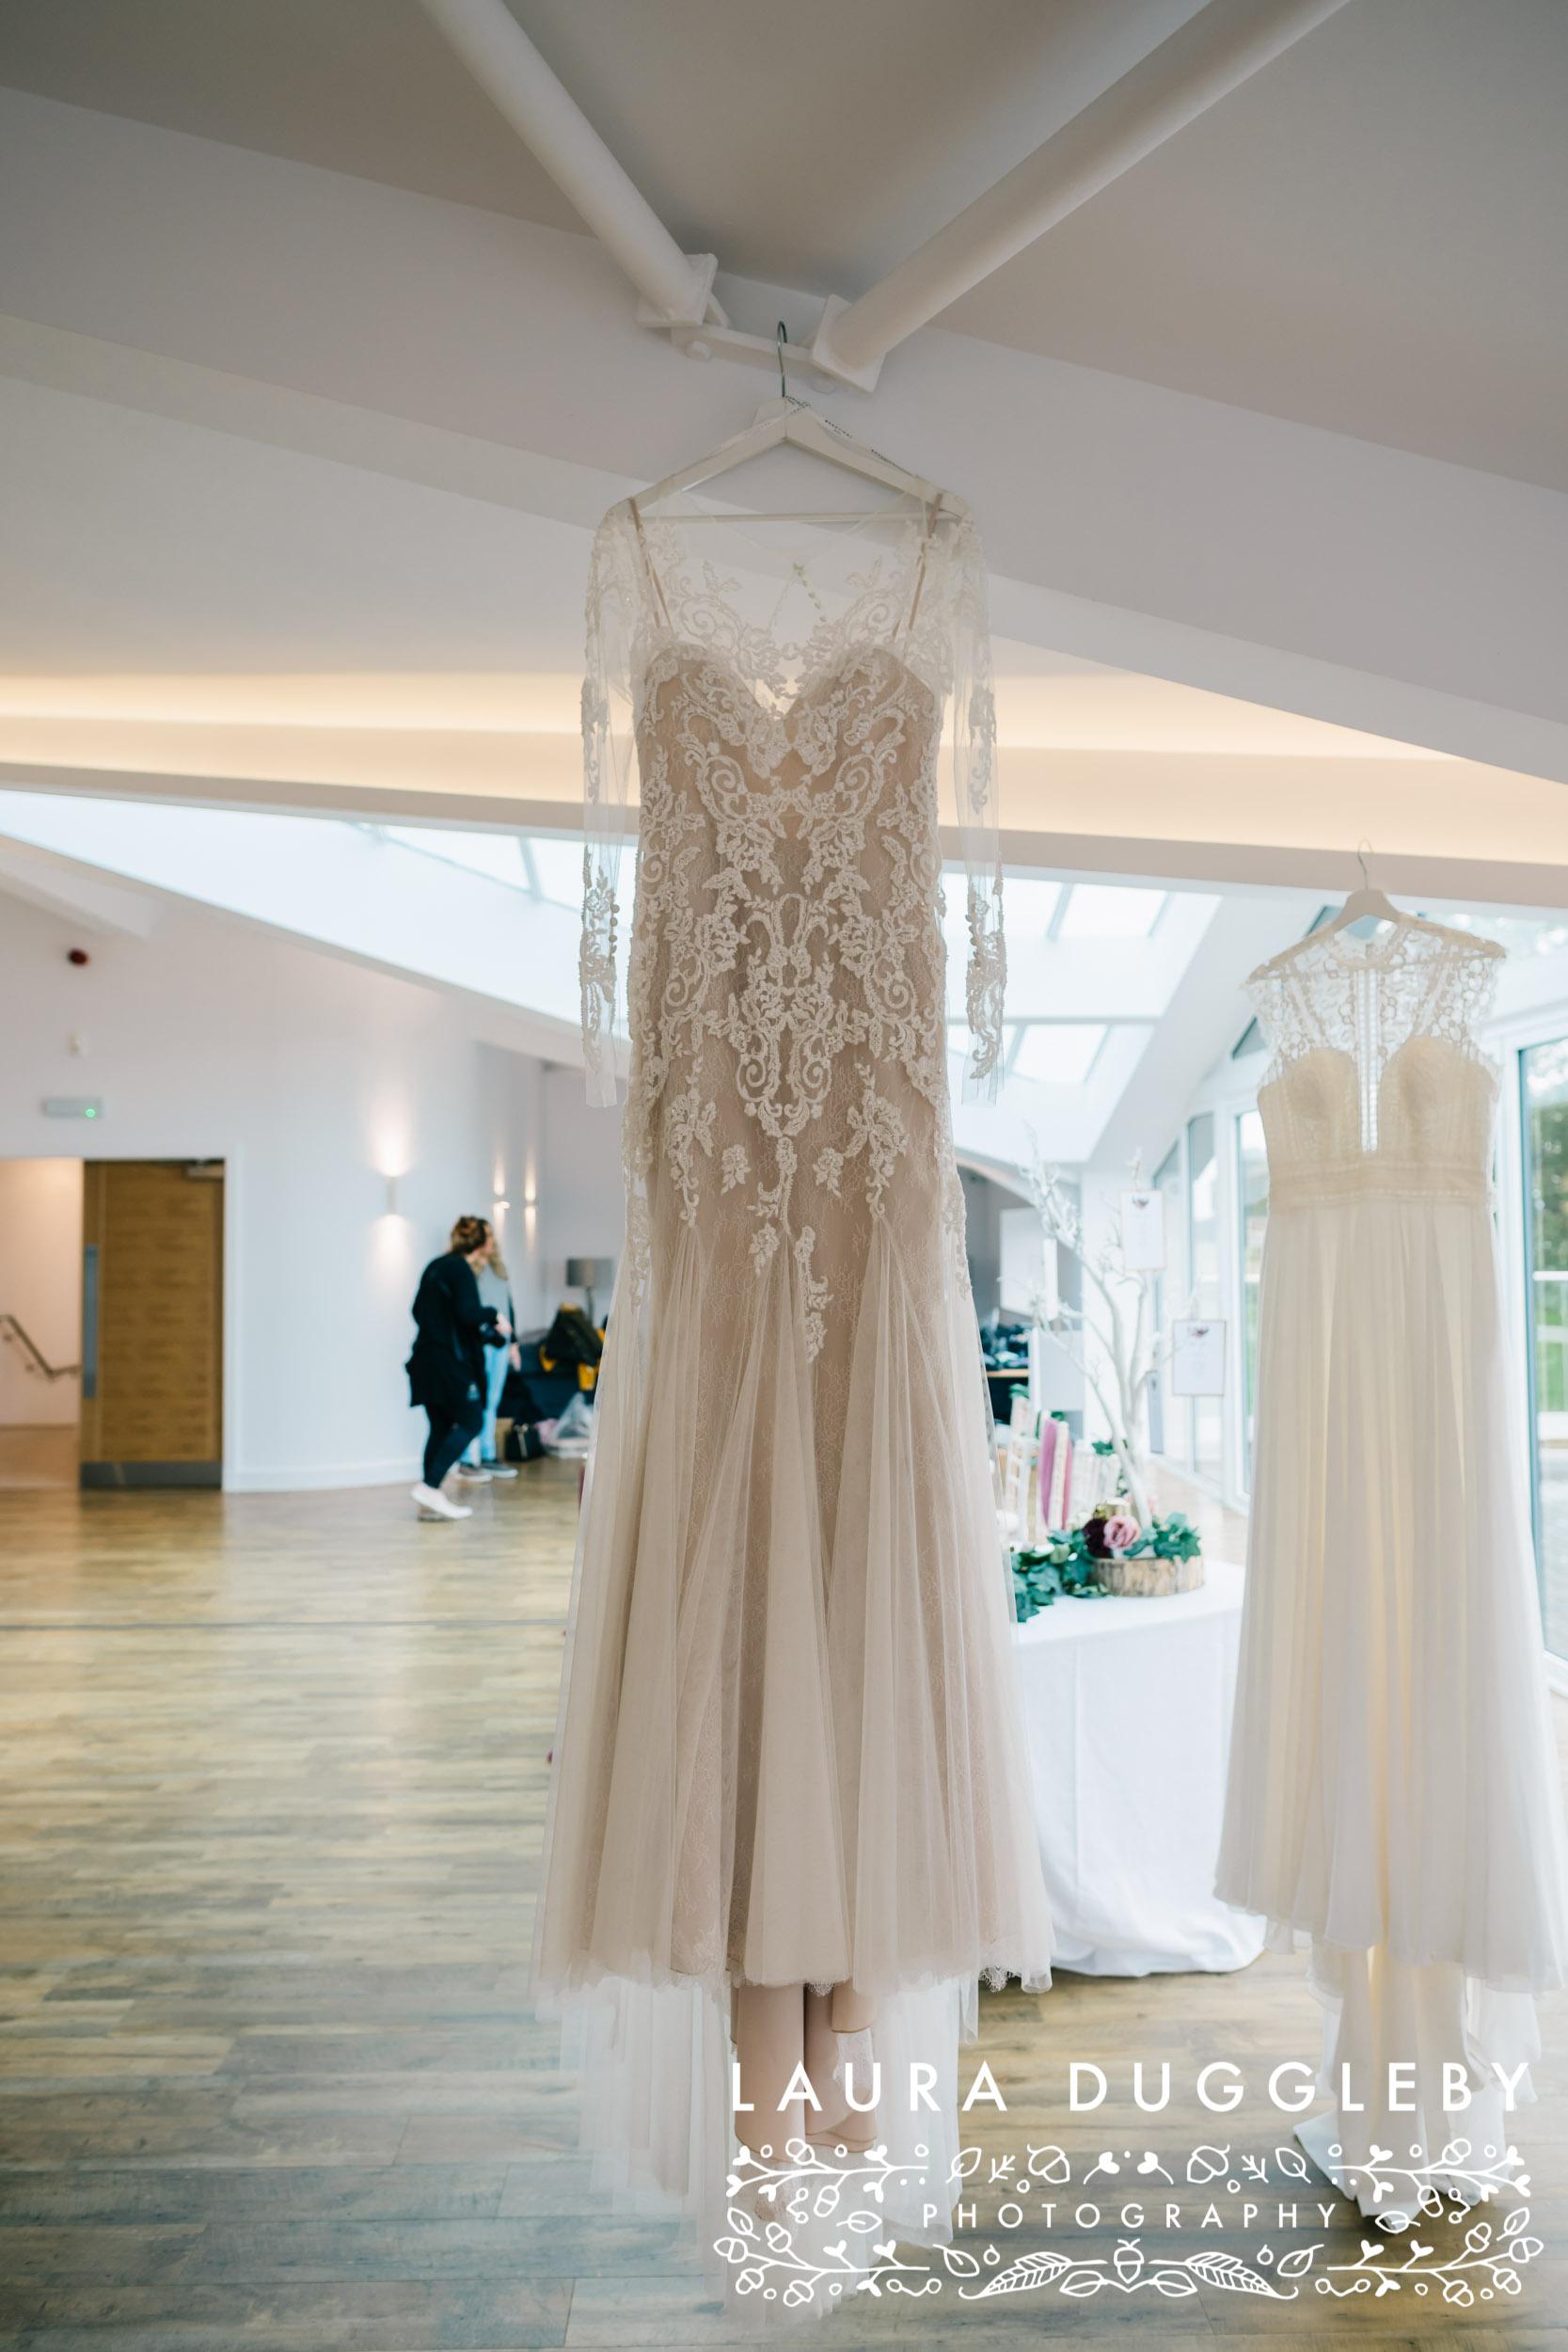 Thornton Hall Country Park - Wedding Photographer